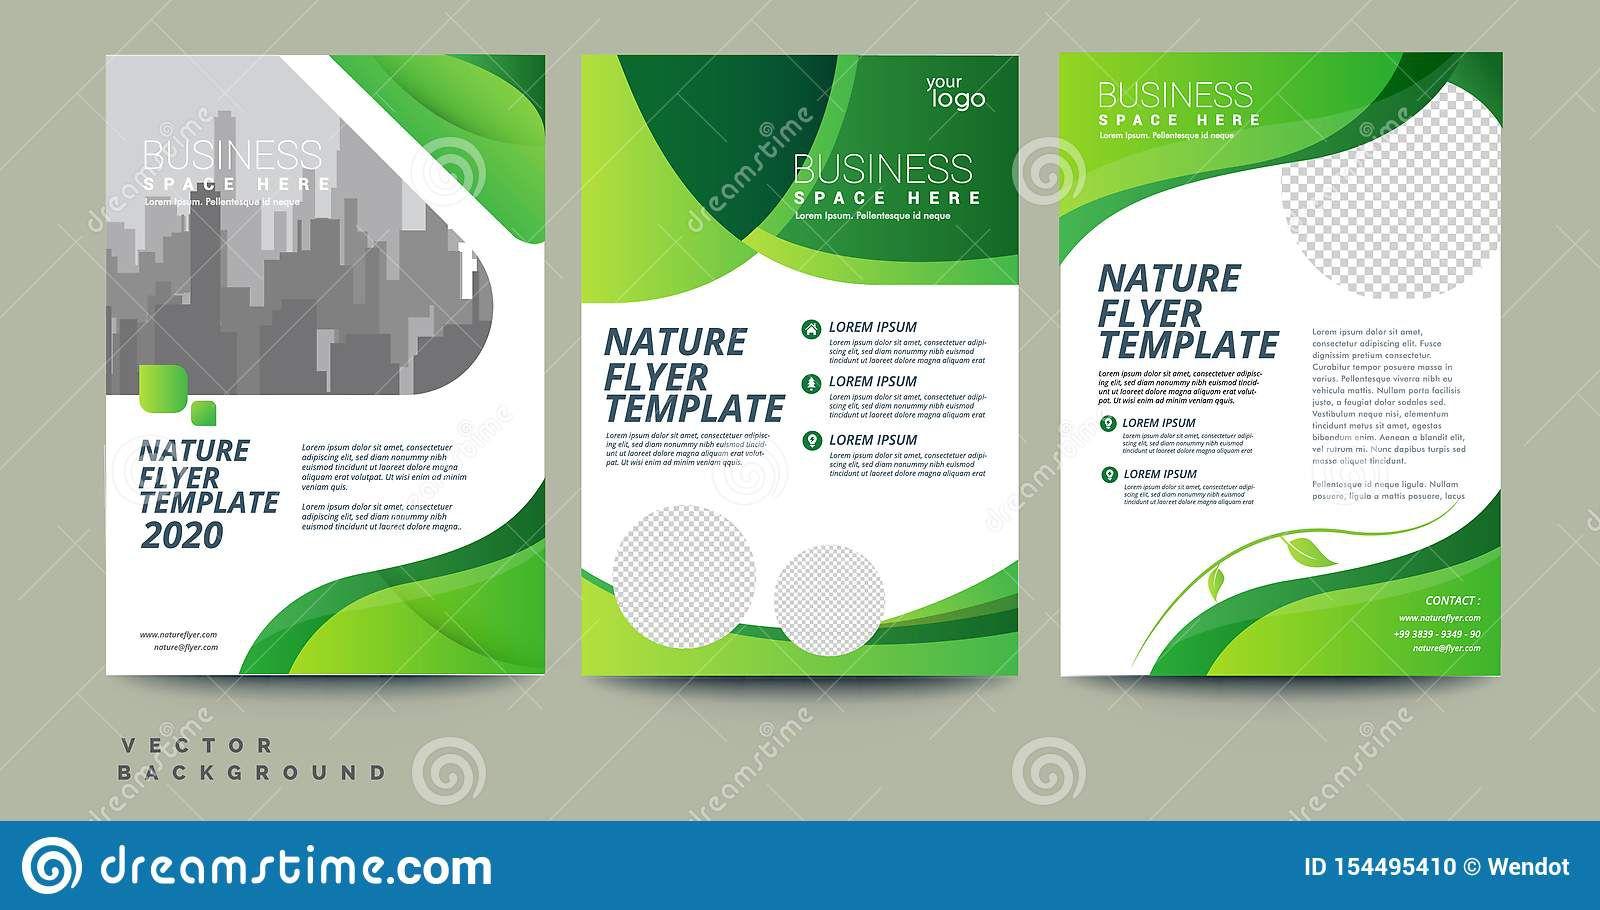 013 Singular Free Flyer Design Template High Resolution  Templates Online Download PsdFull